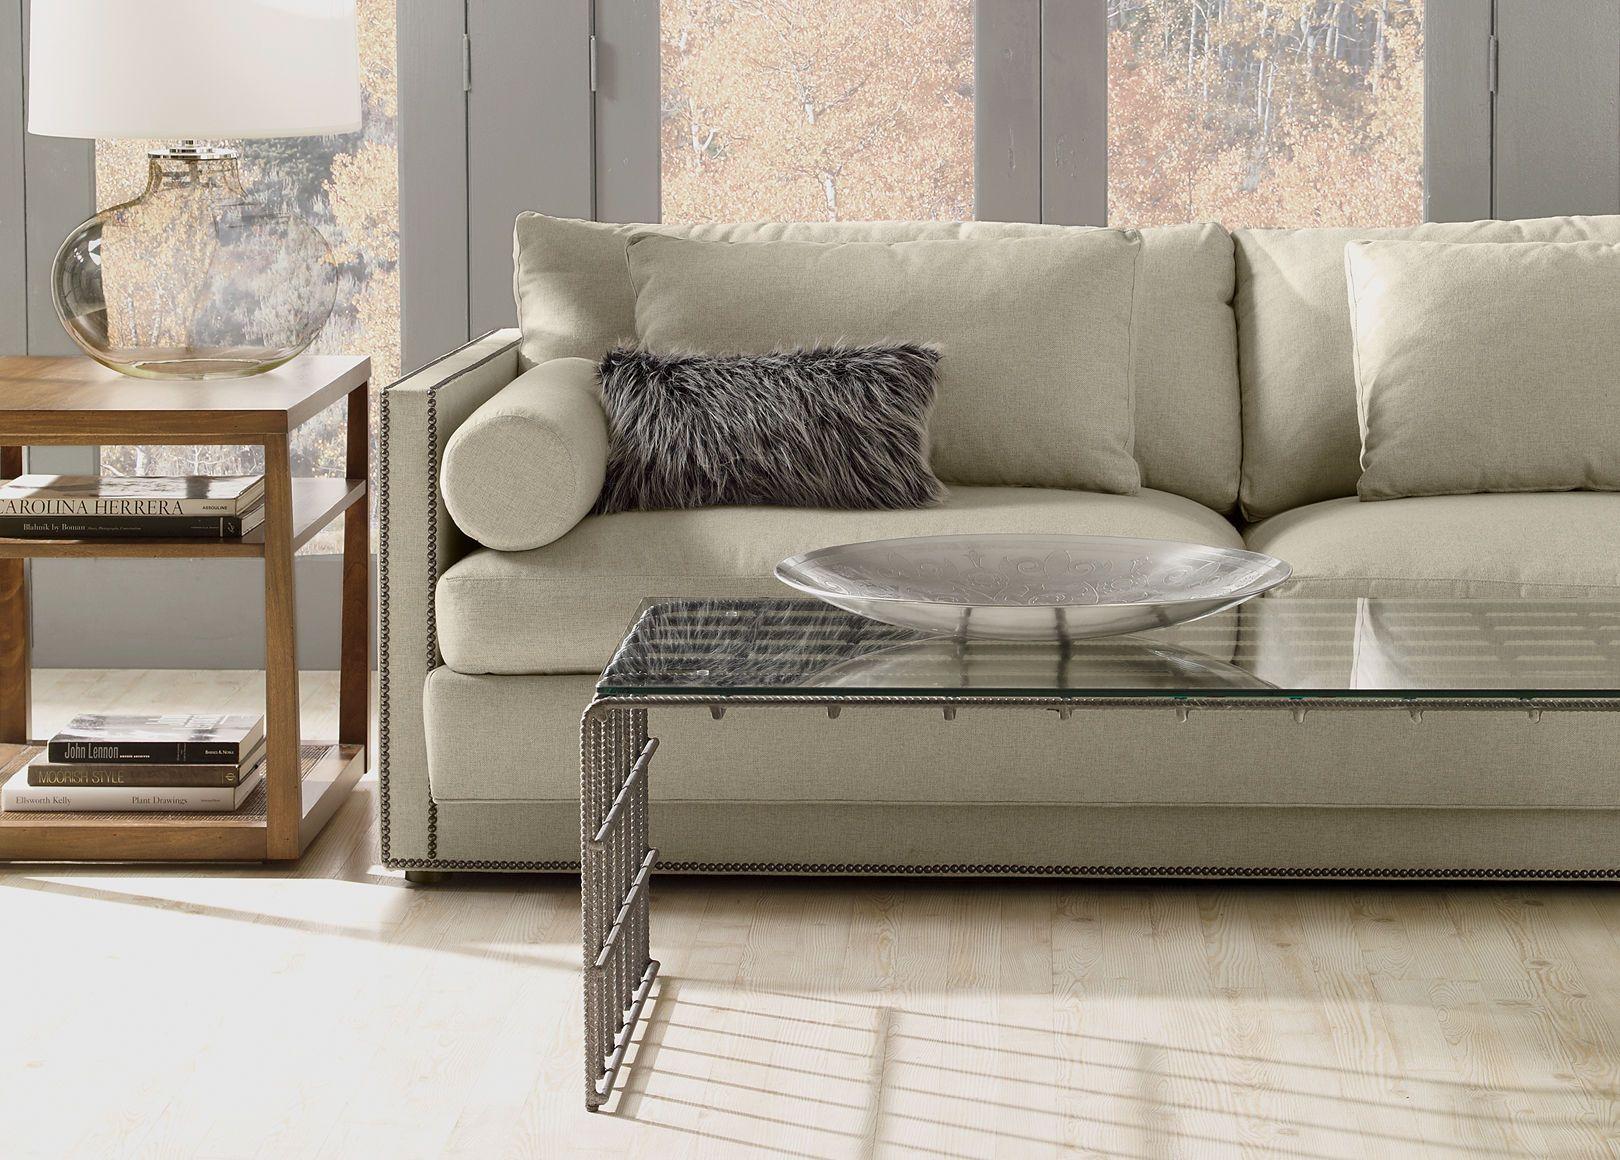 Gage Coffee Table Furniture Living Room Sofa Home Decor